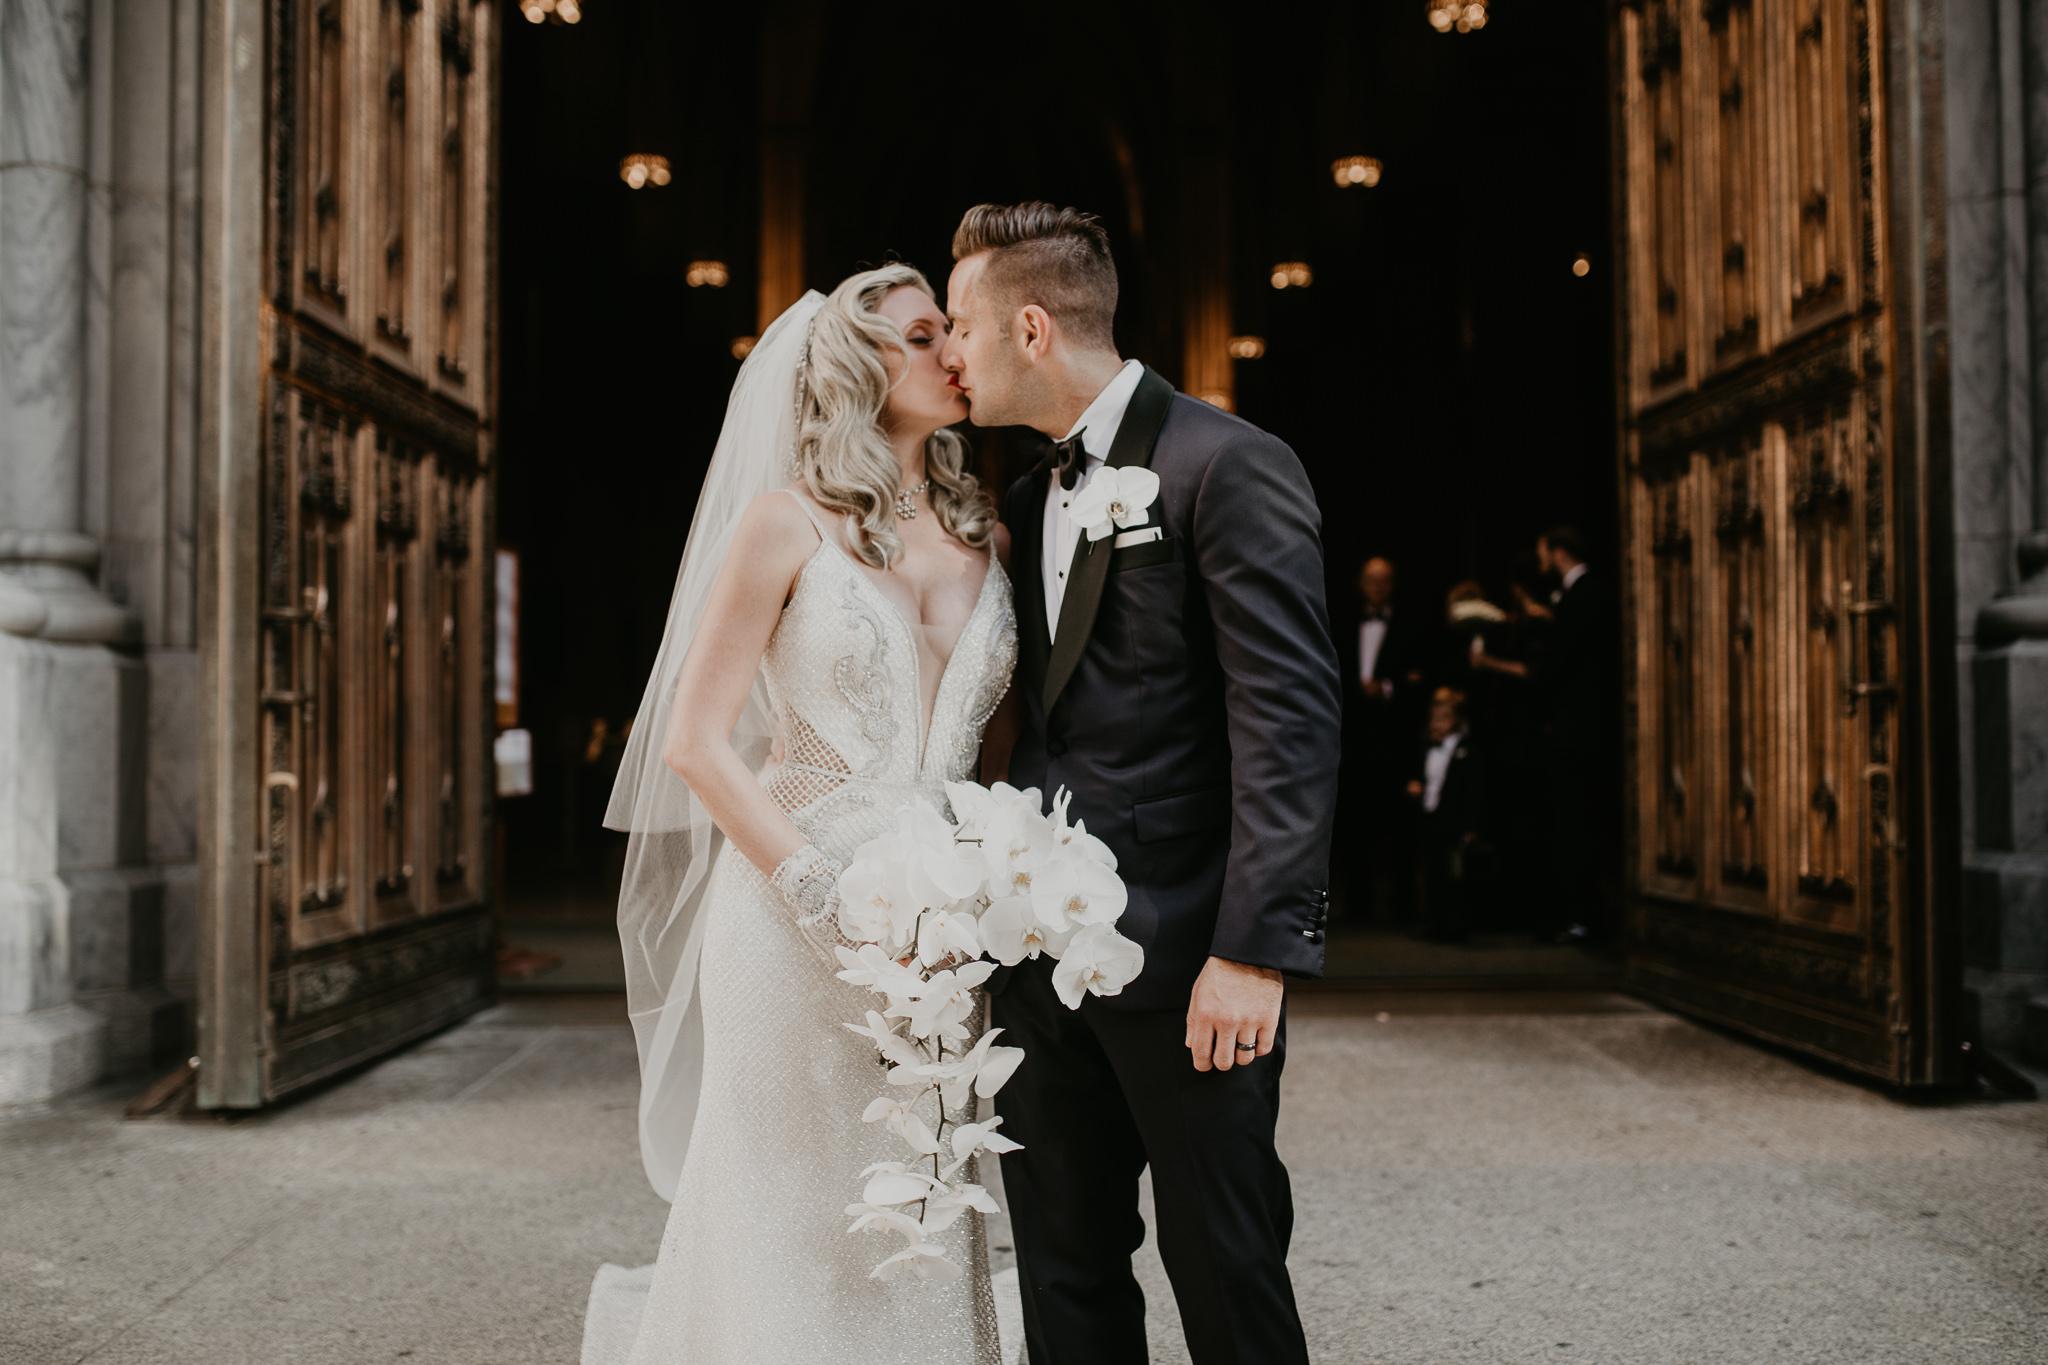 M+J_NYC_Wedding_StPatricks_30Rock_RainbowRoom_094.jpg